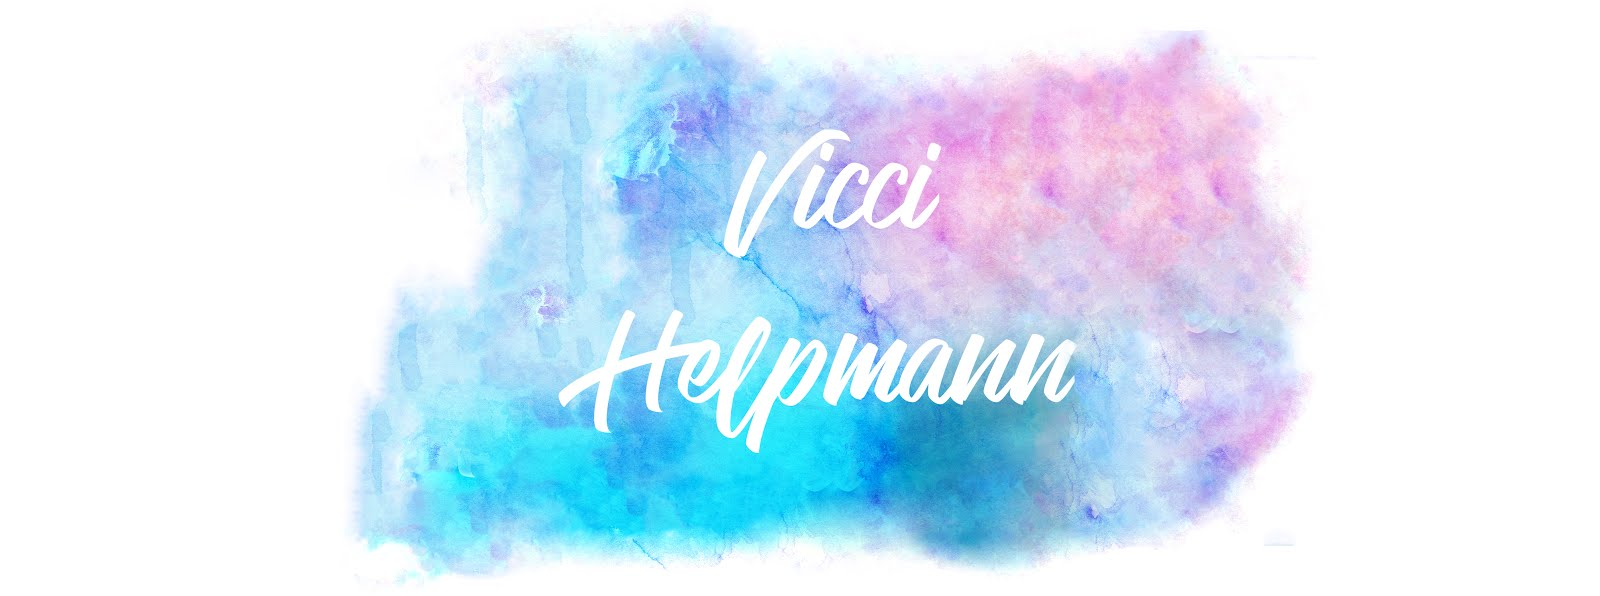 Vicci Helpmann